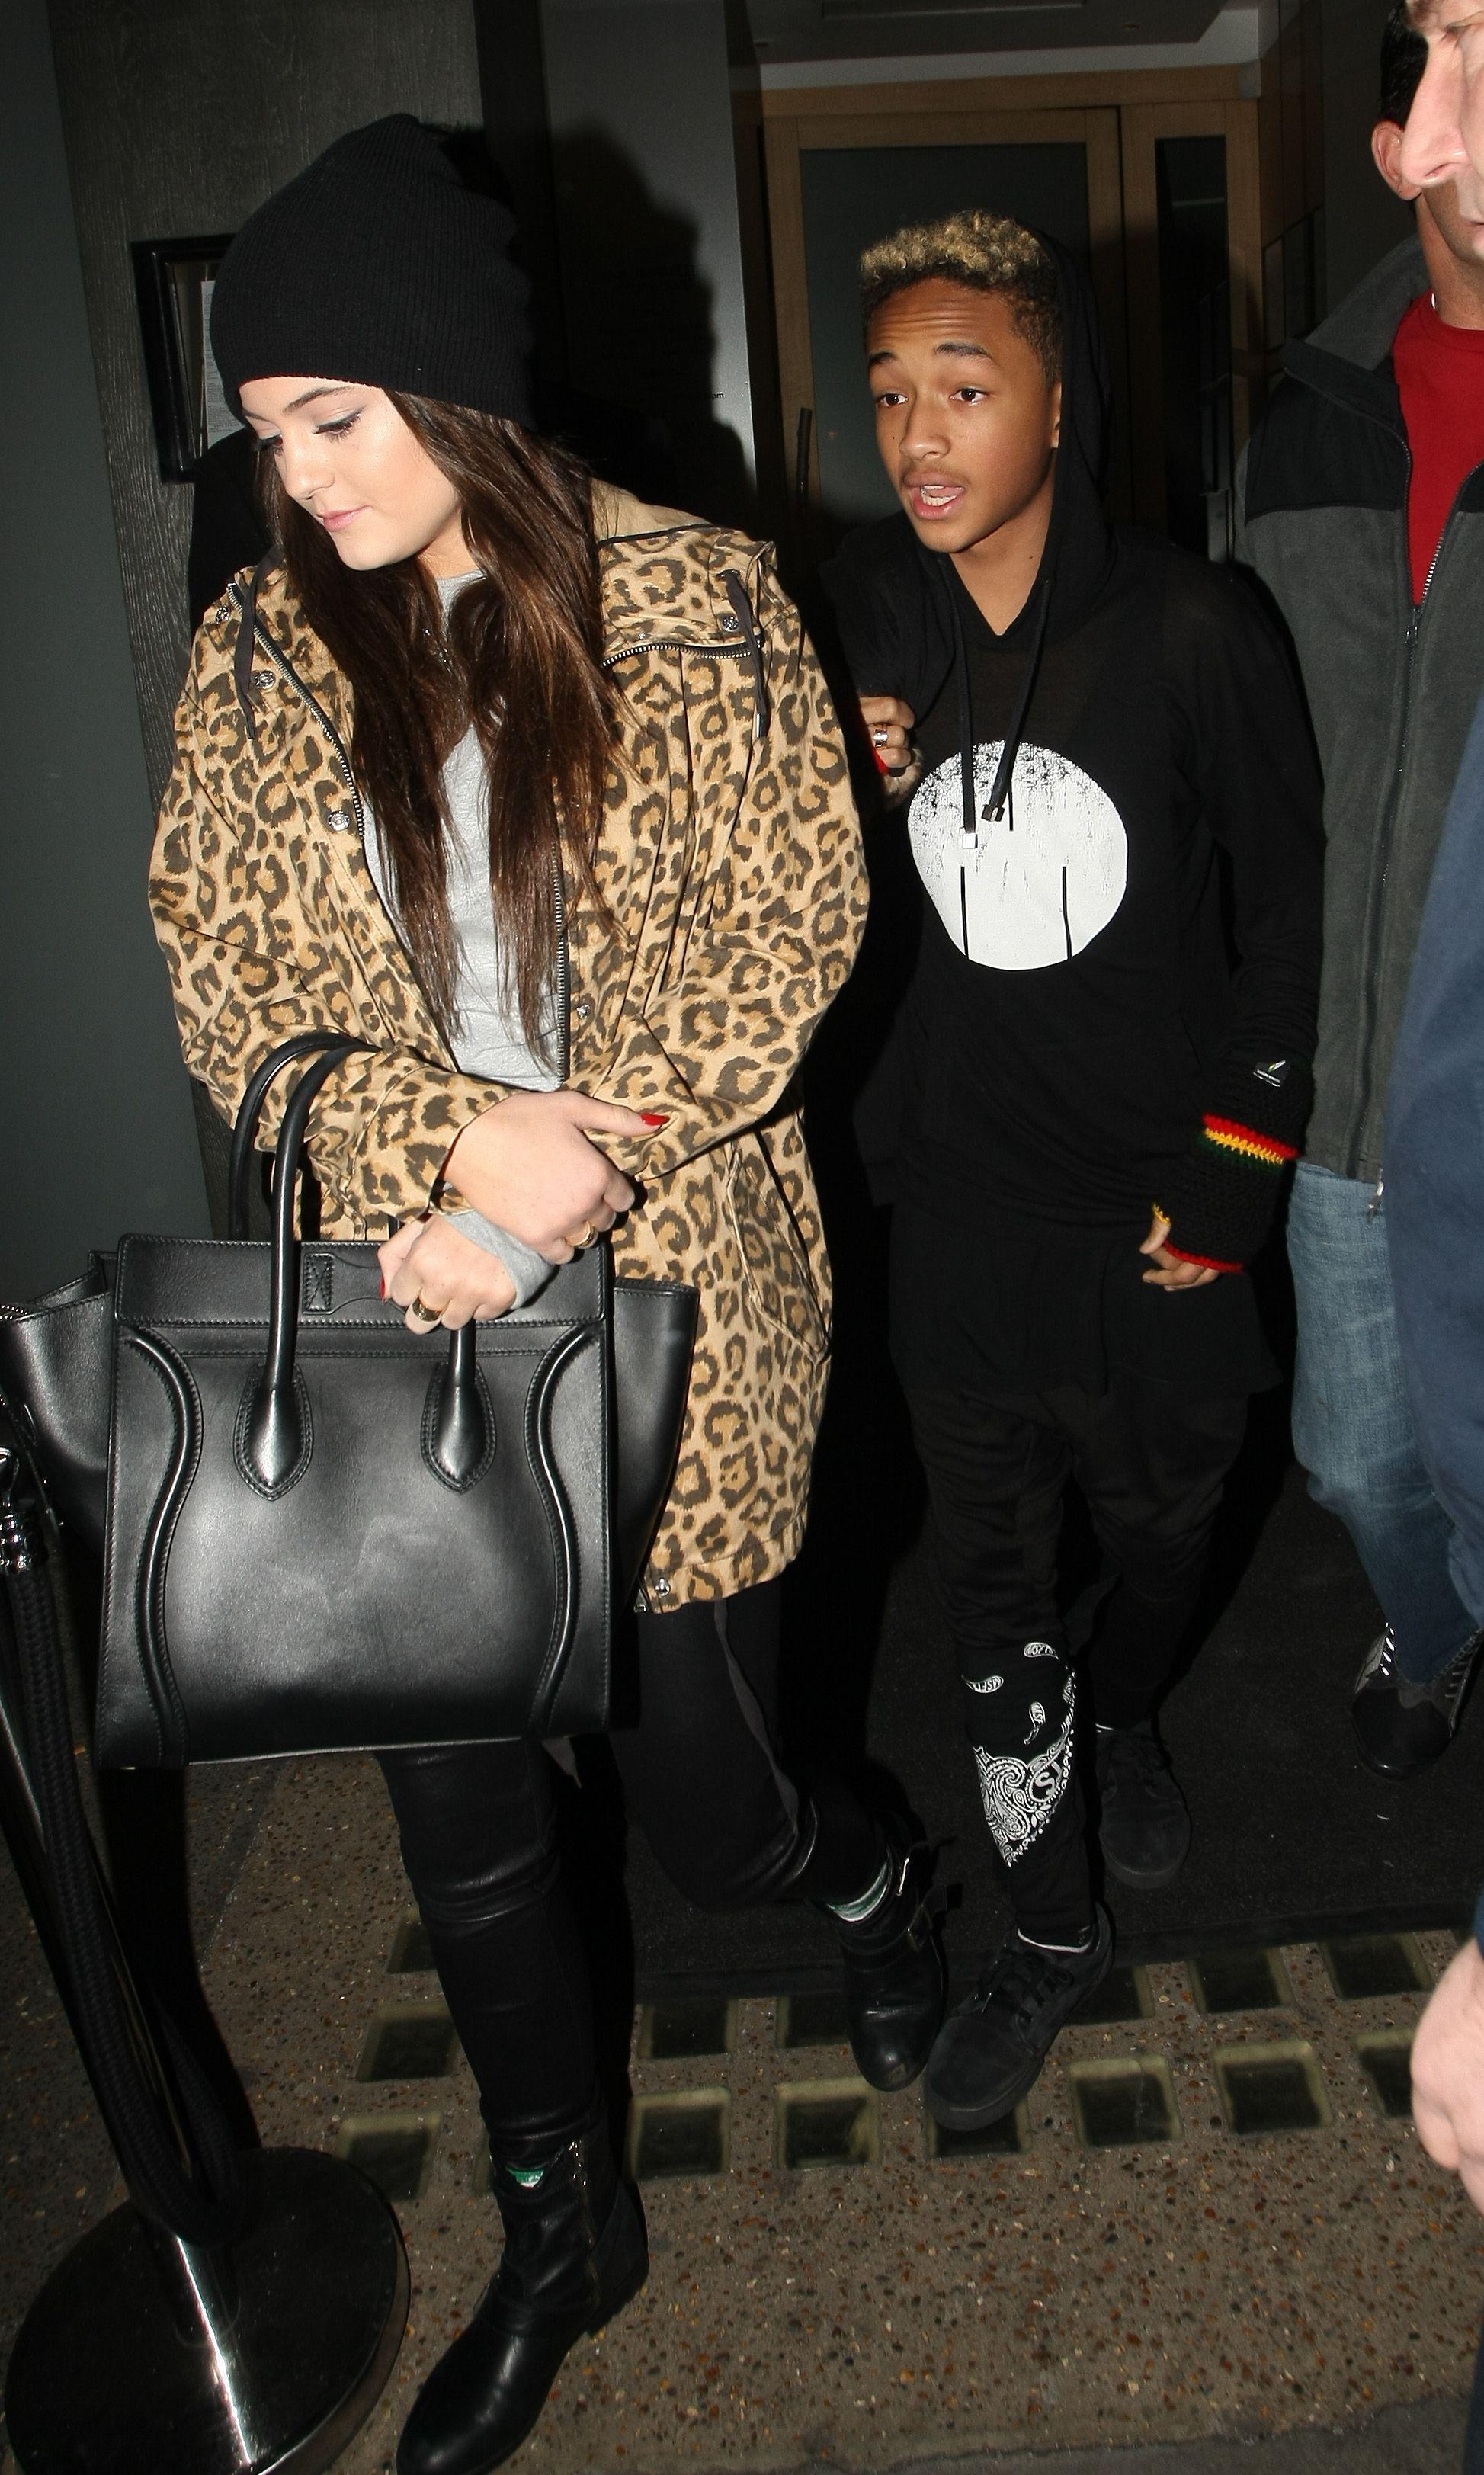 Kardashian søster dating Jaden Smith Reddit Orlando orgie